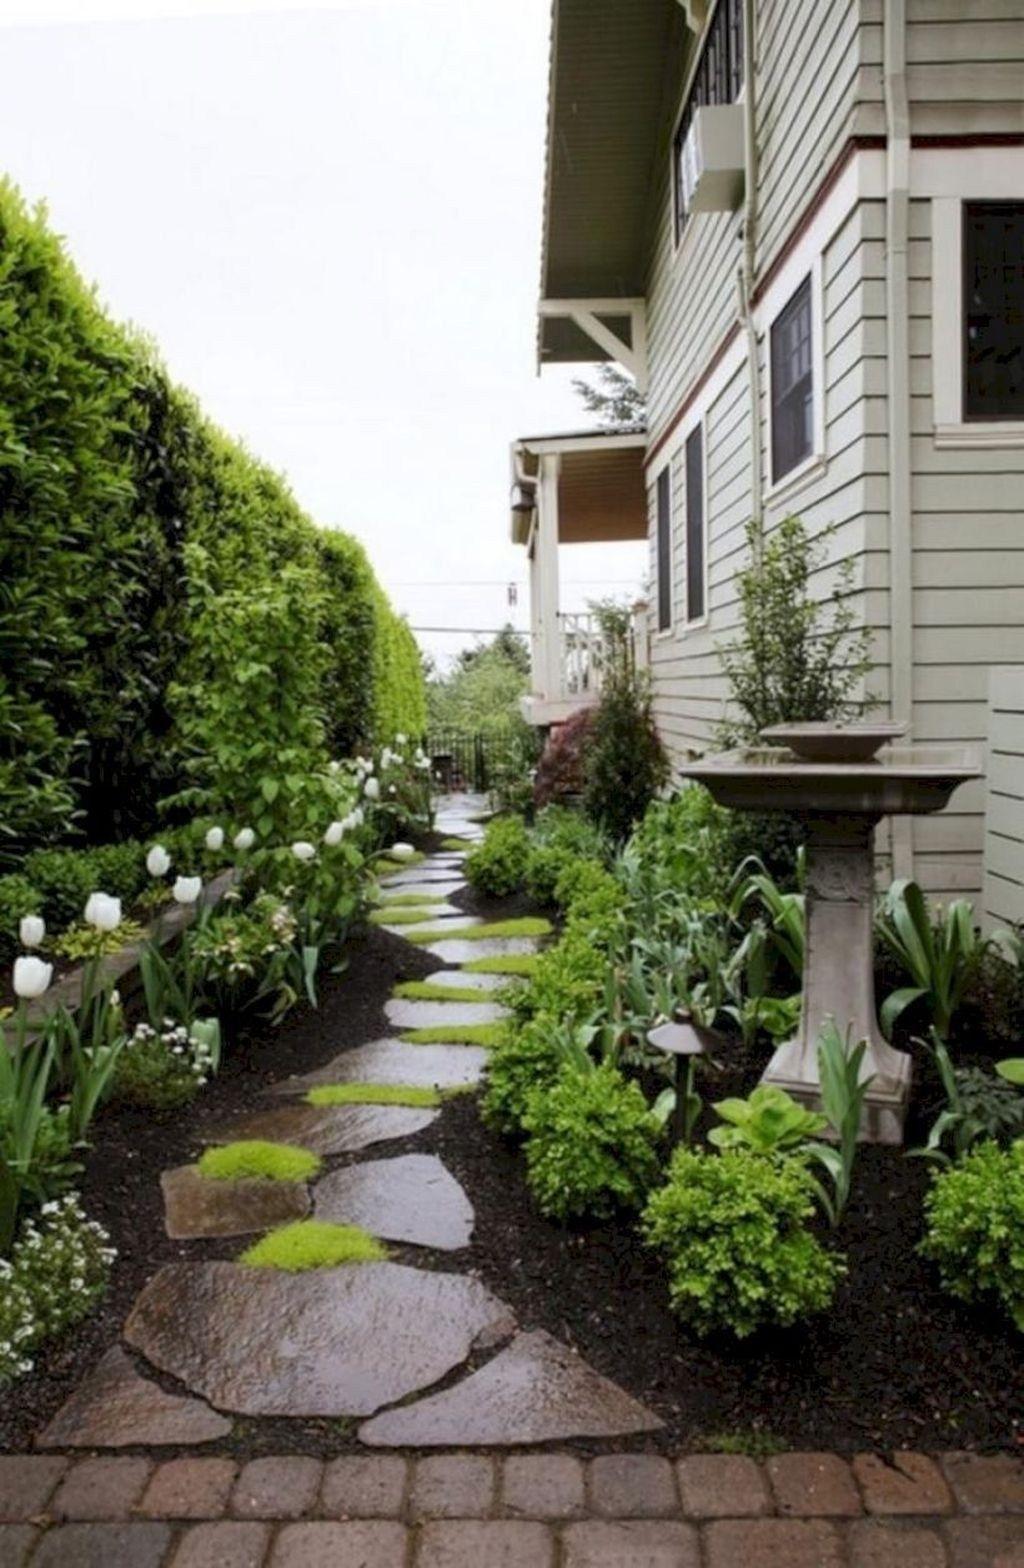 50 backyard landscaping ideas with minimum budget small on backyard landscaping ideas with minimum budget id=49324